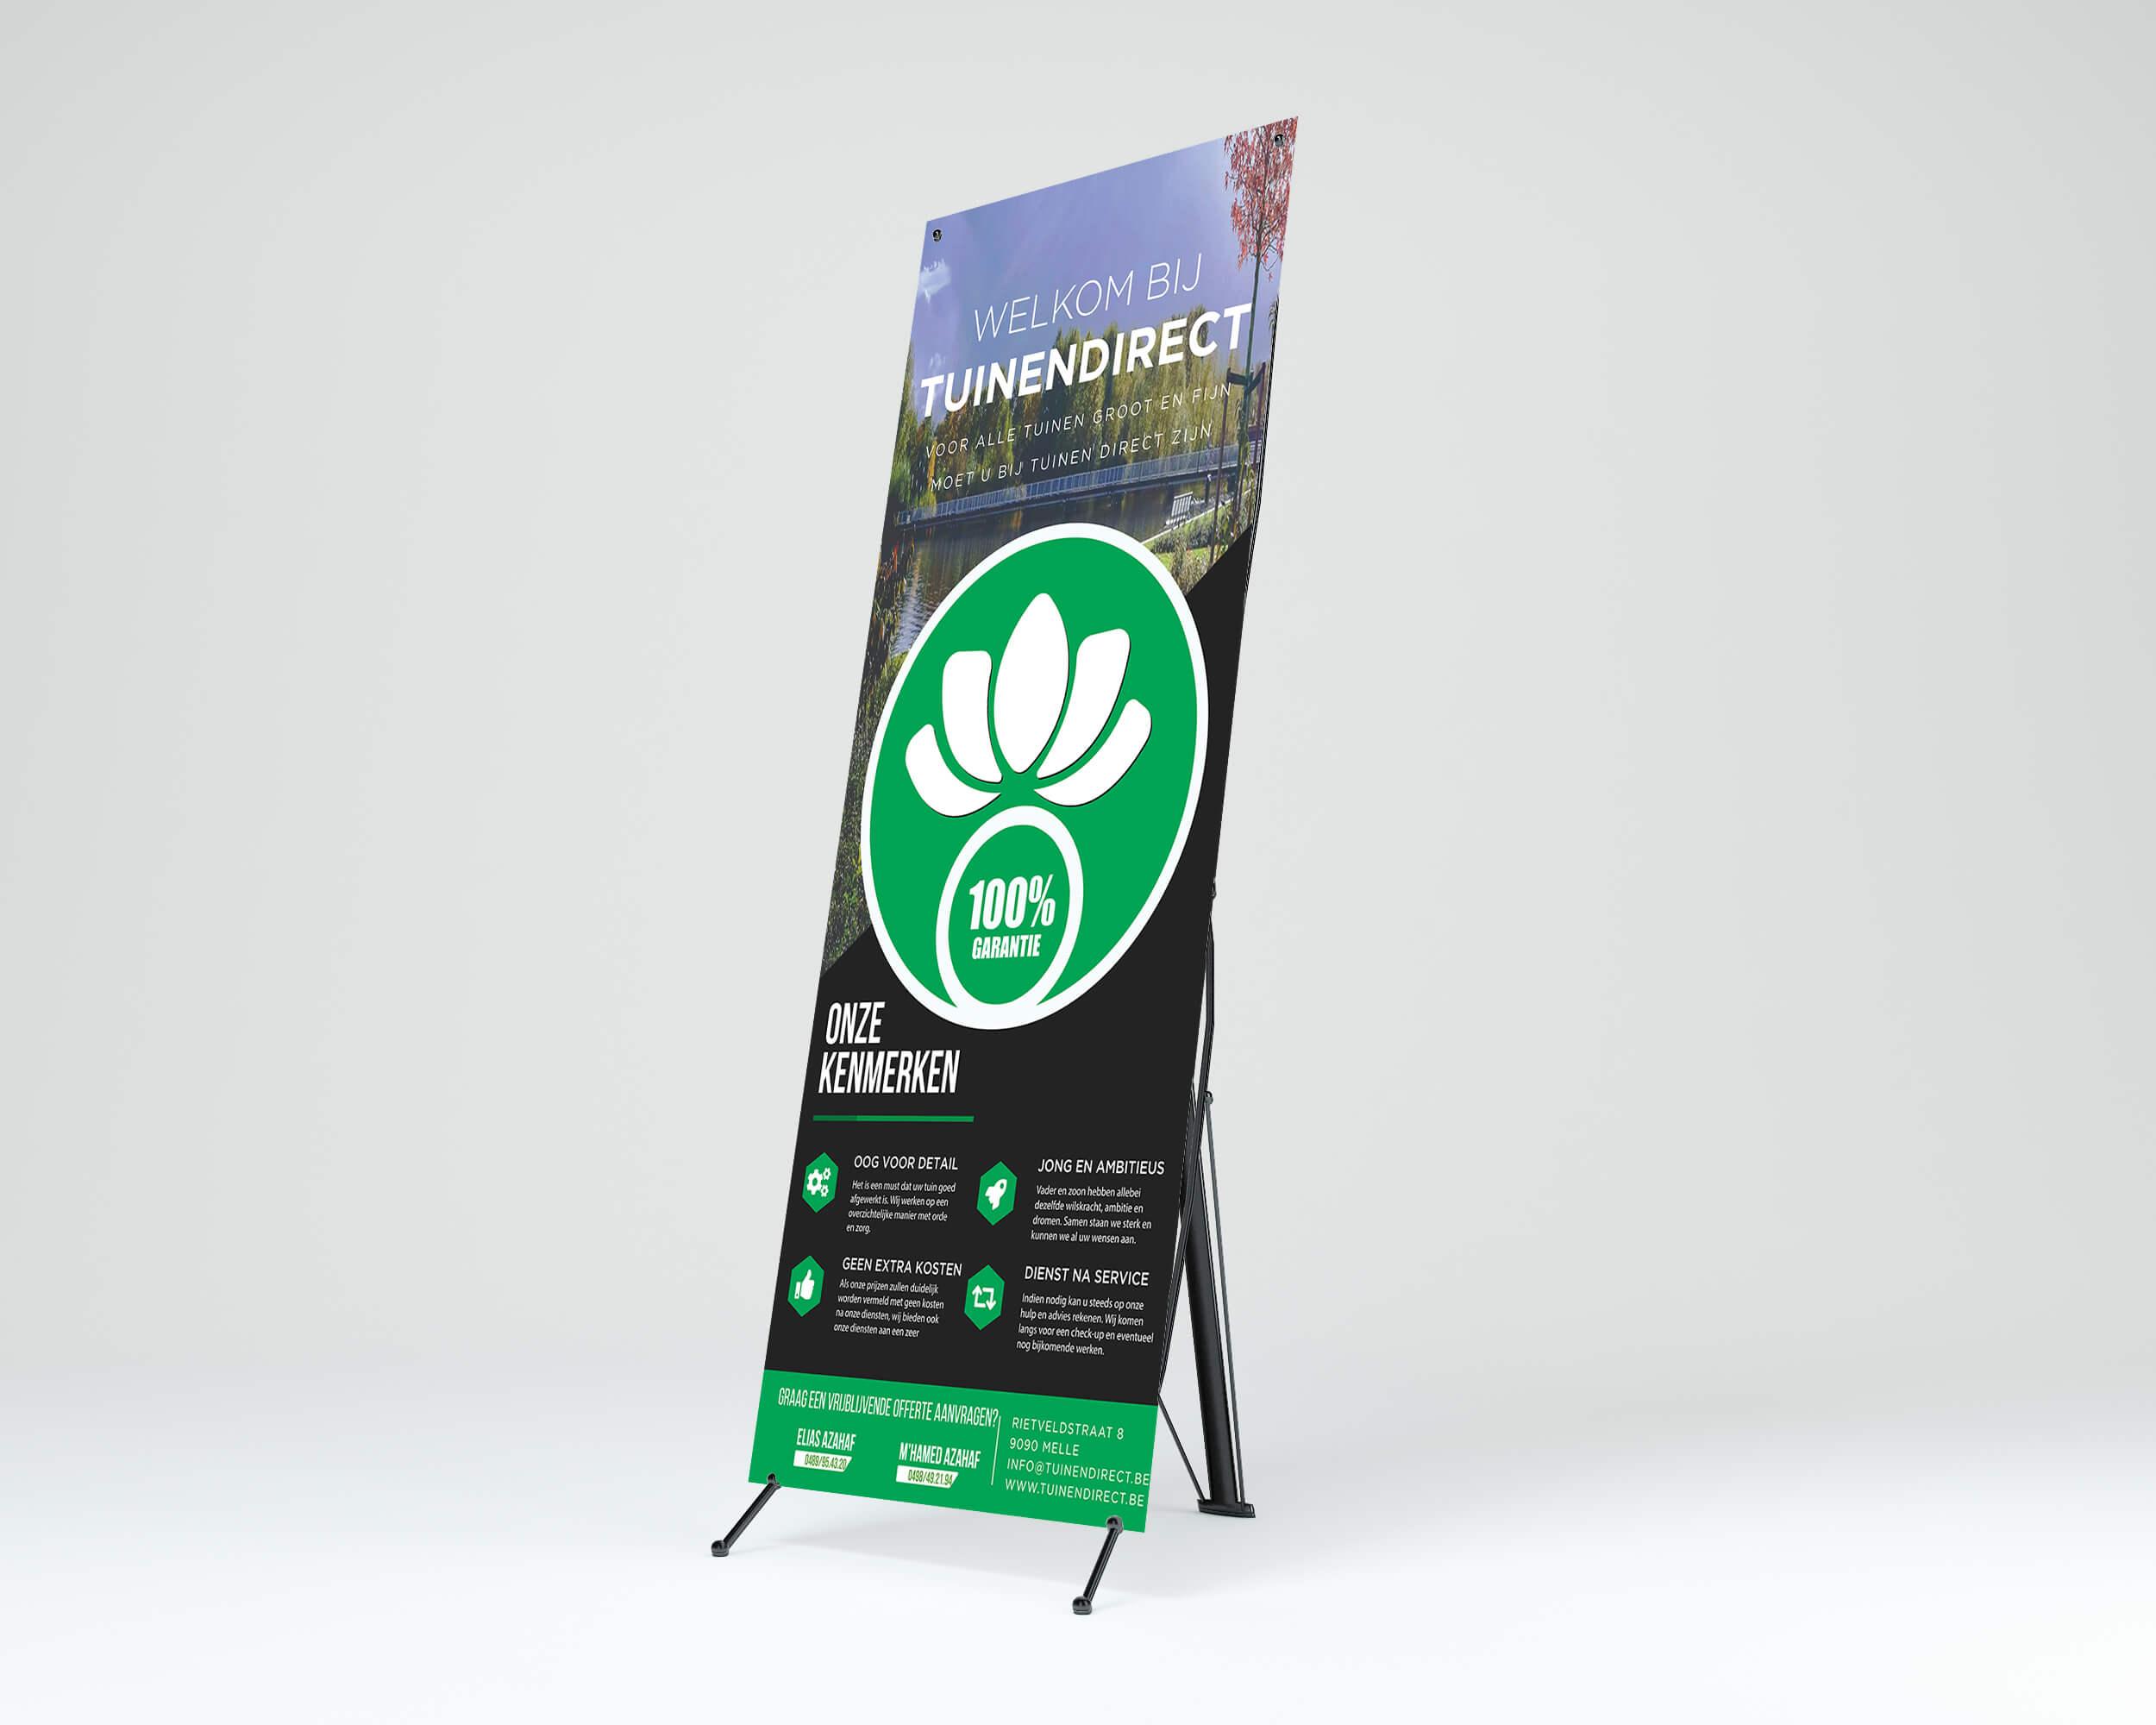 Tuinendirect banner